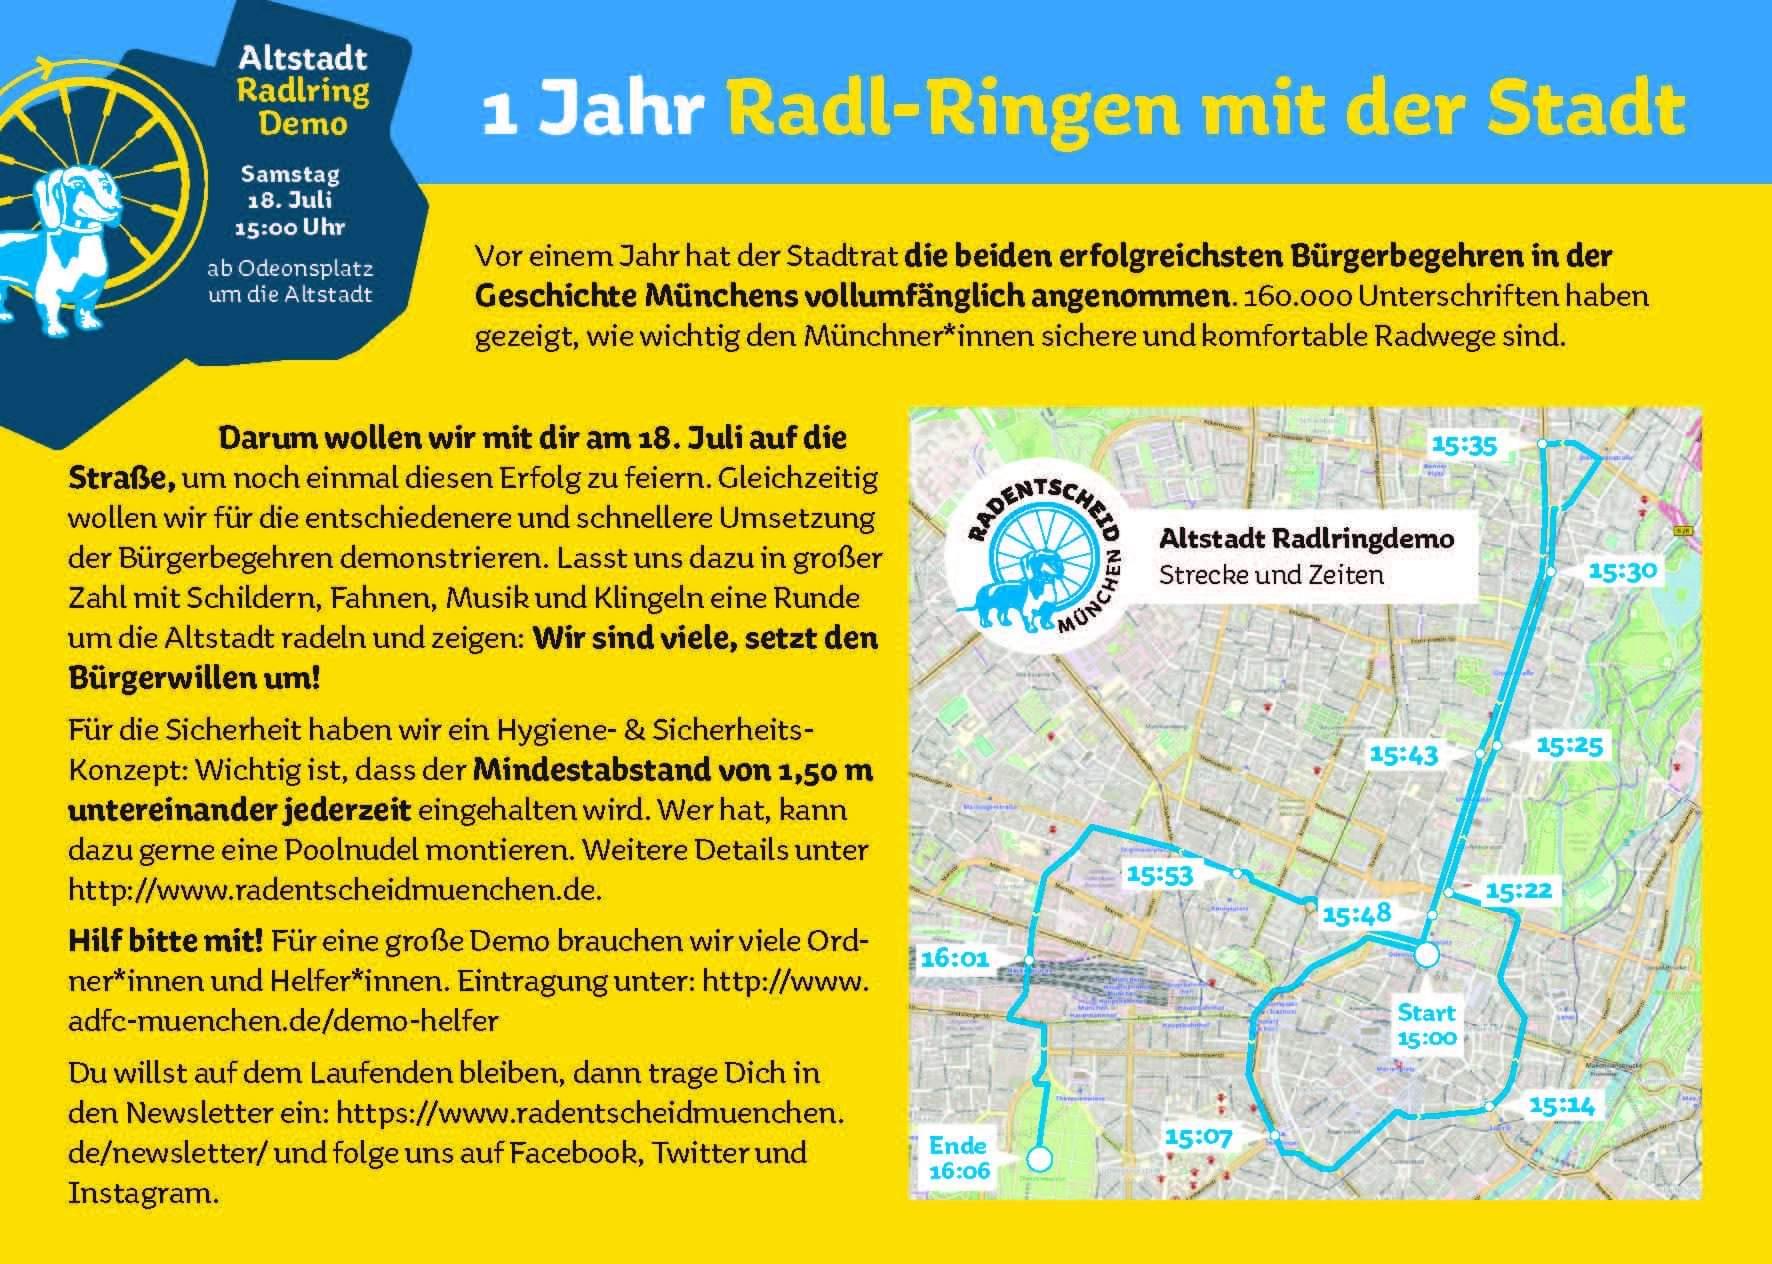 Radlringen 17.7.2020 Odeonsplatz 15h